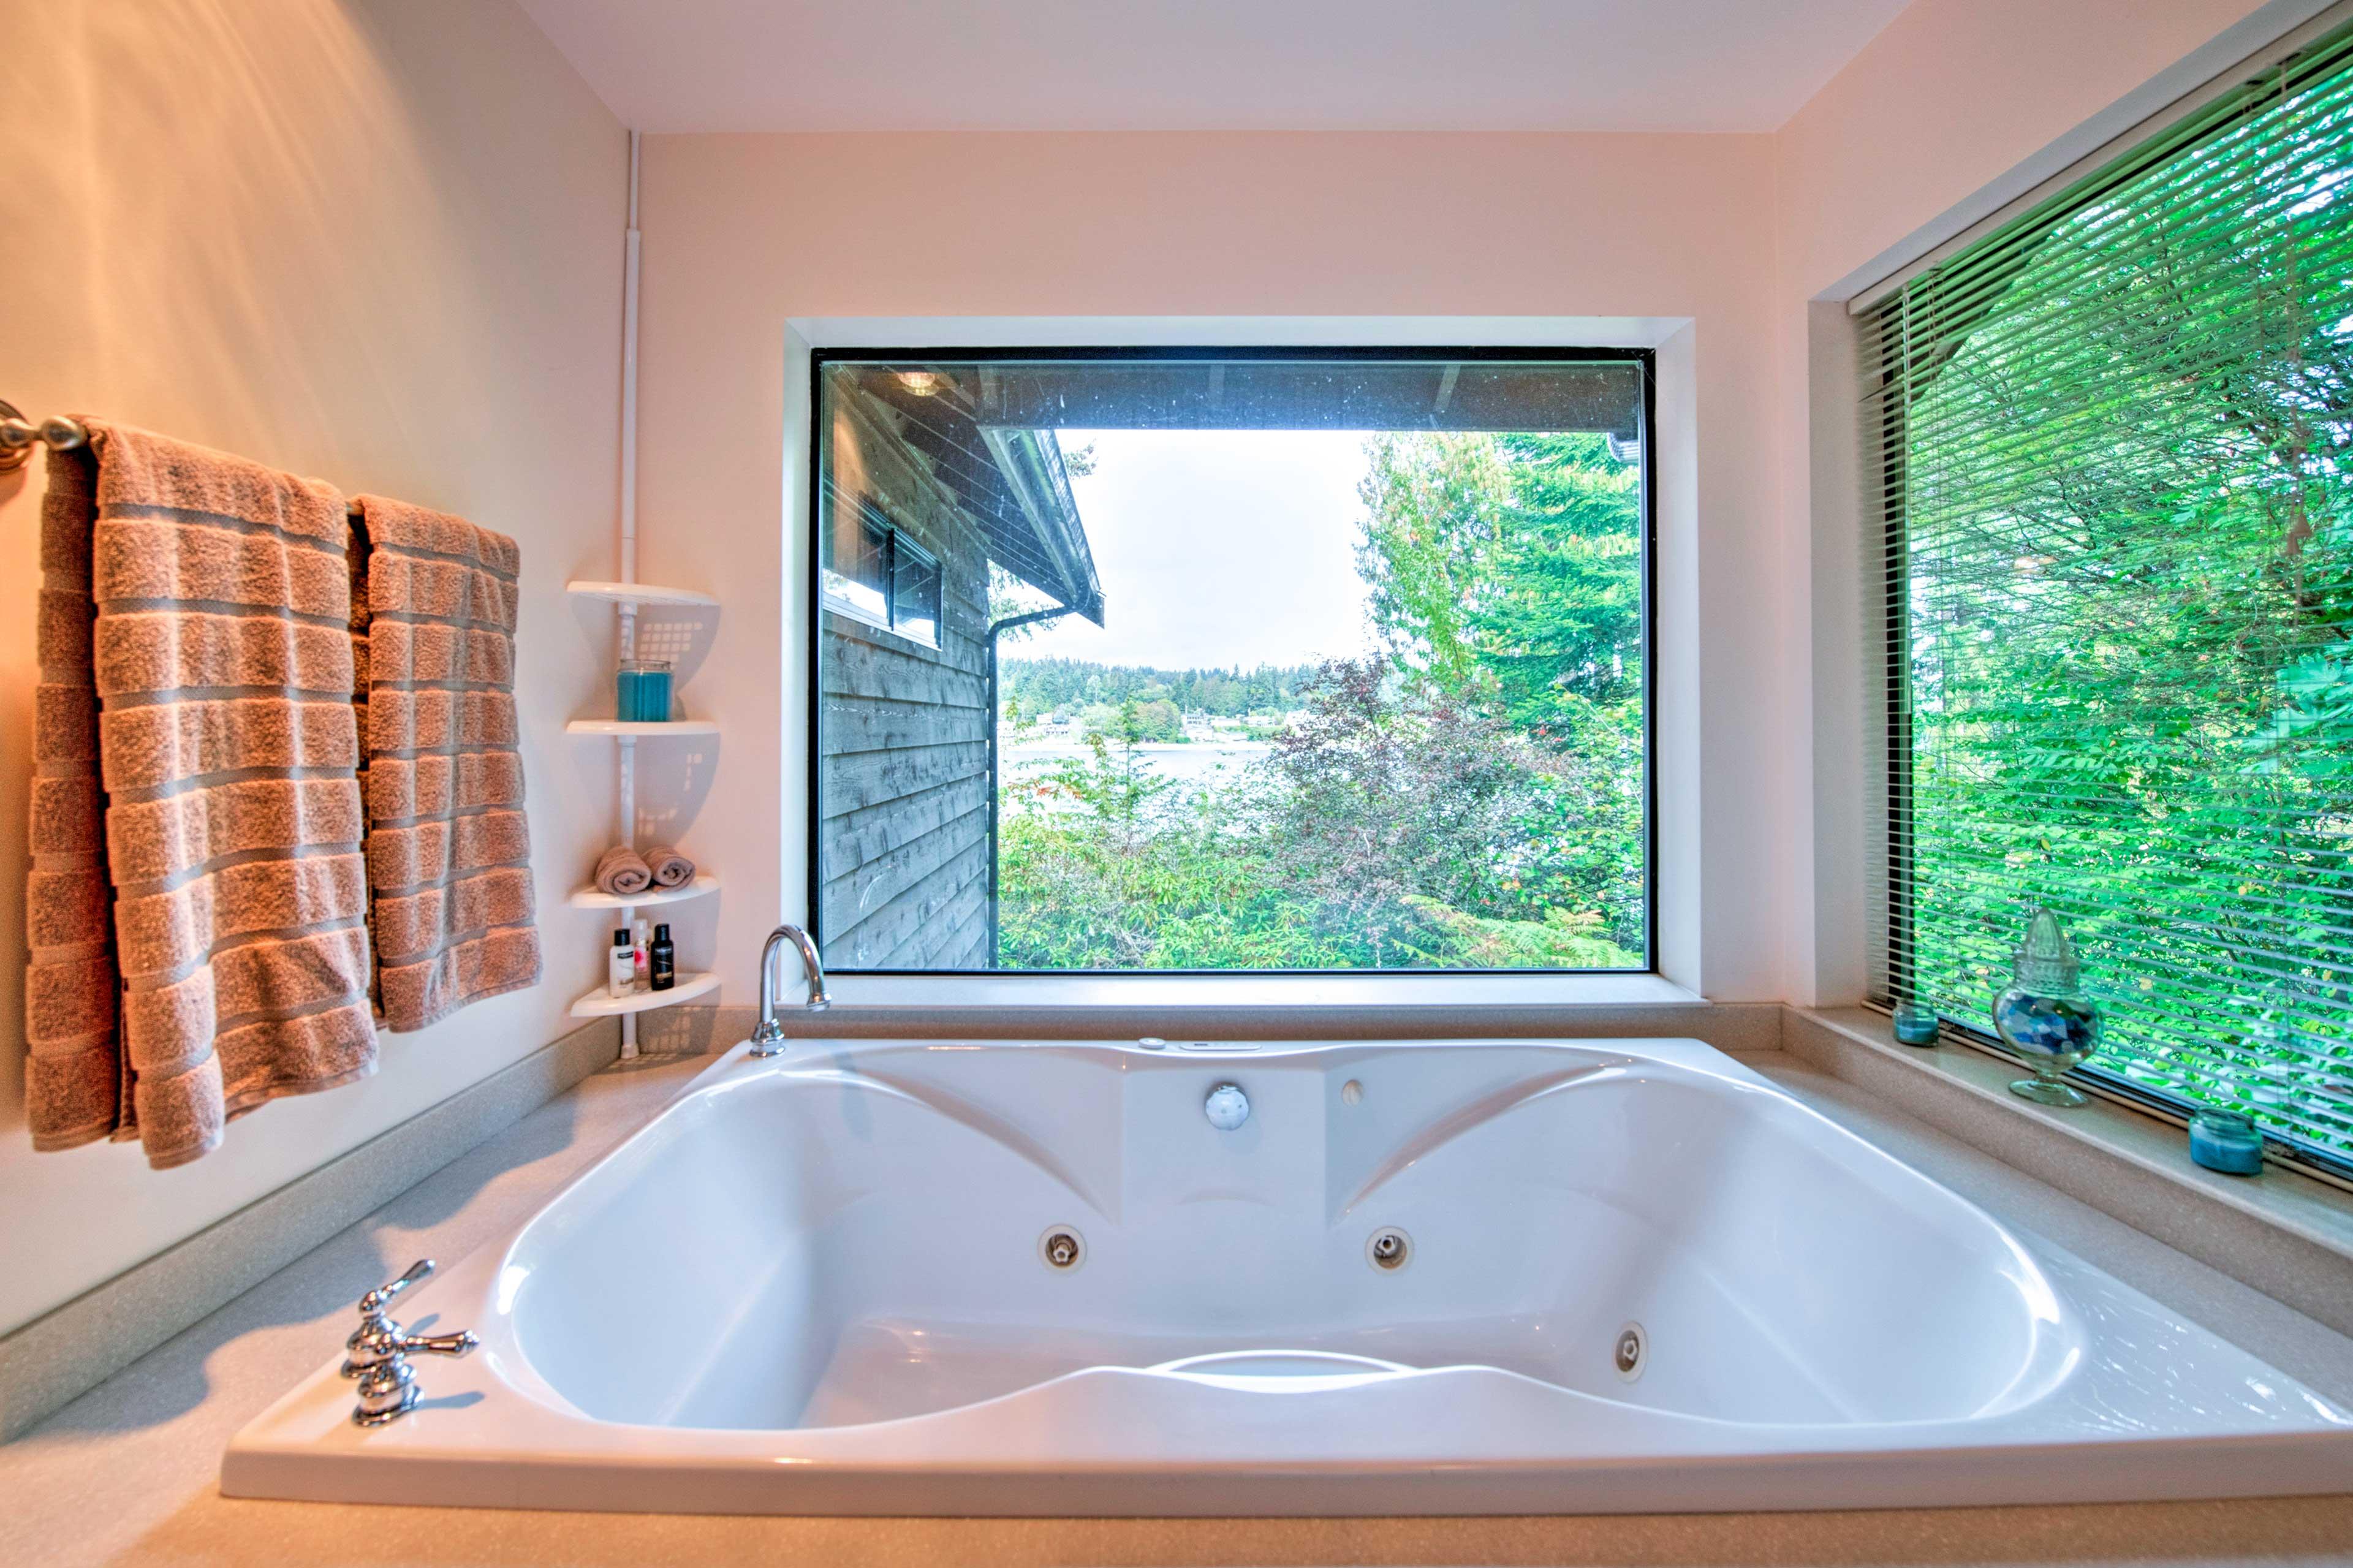 Bathroom | 2nd Floor | Jetted Soaking Tub